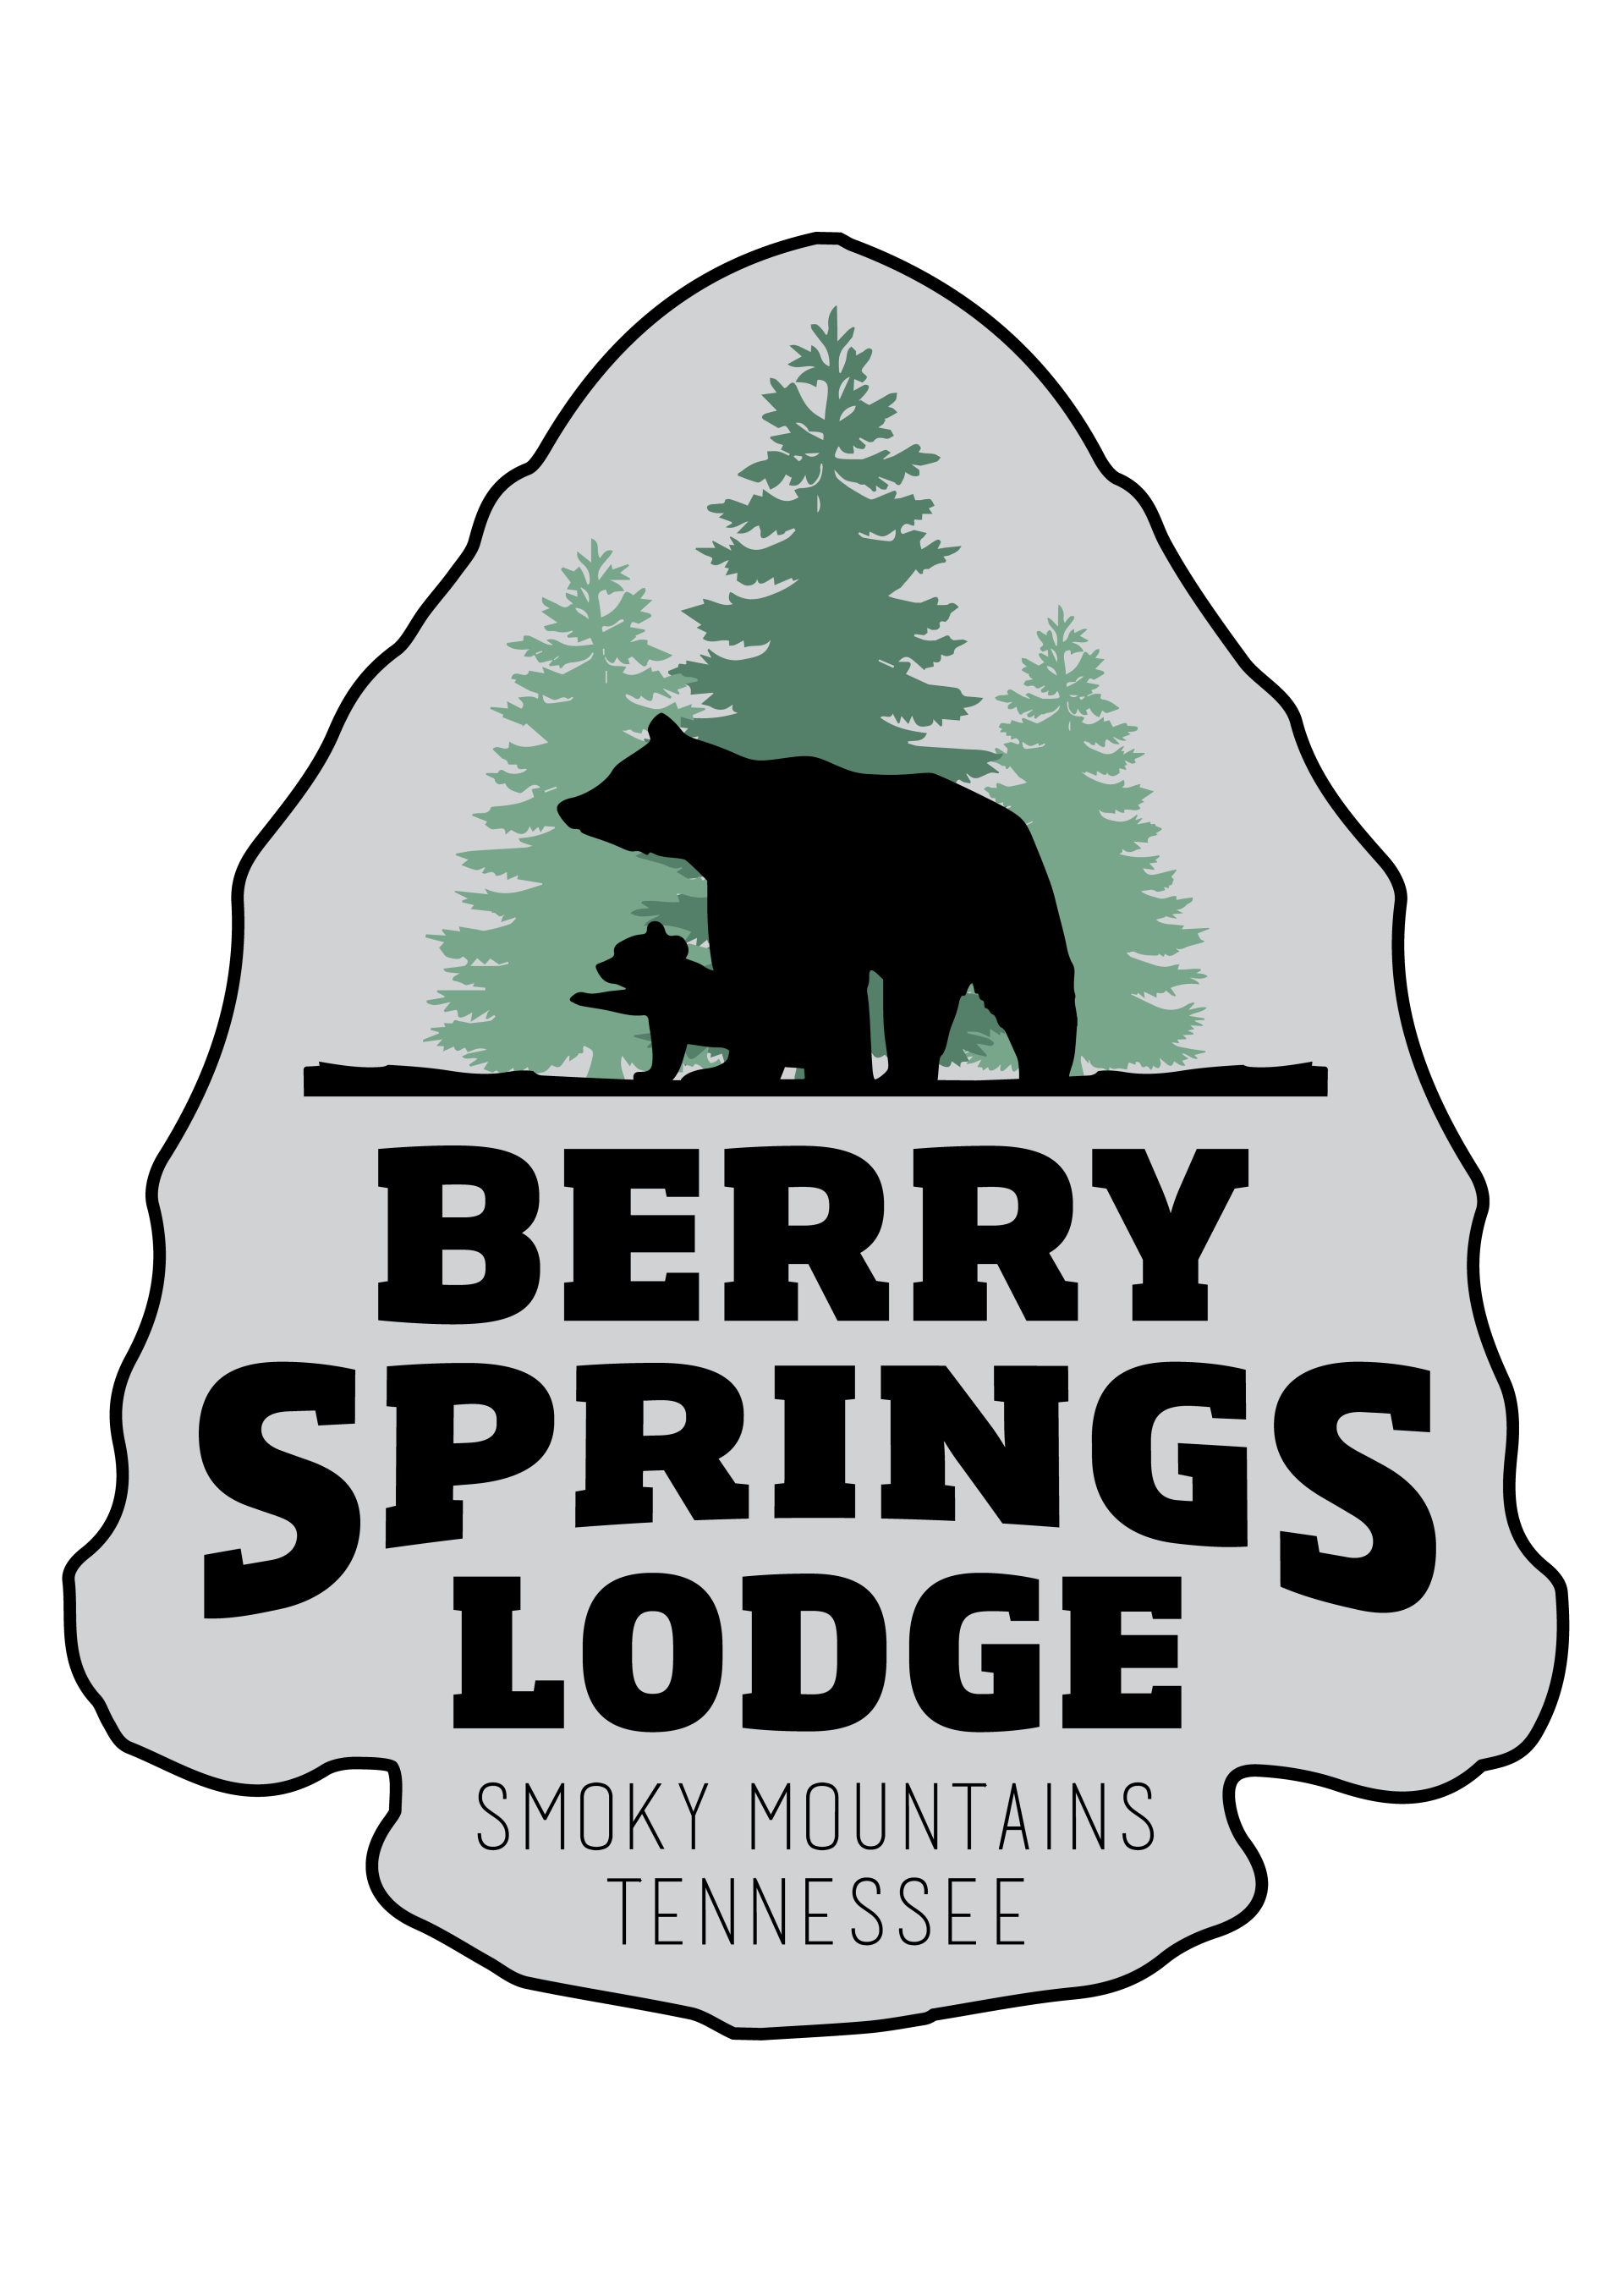 Gatlinburg Bed And Breakfast Tn Berry Springs Lodge